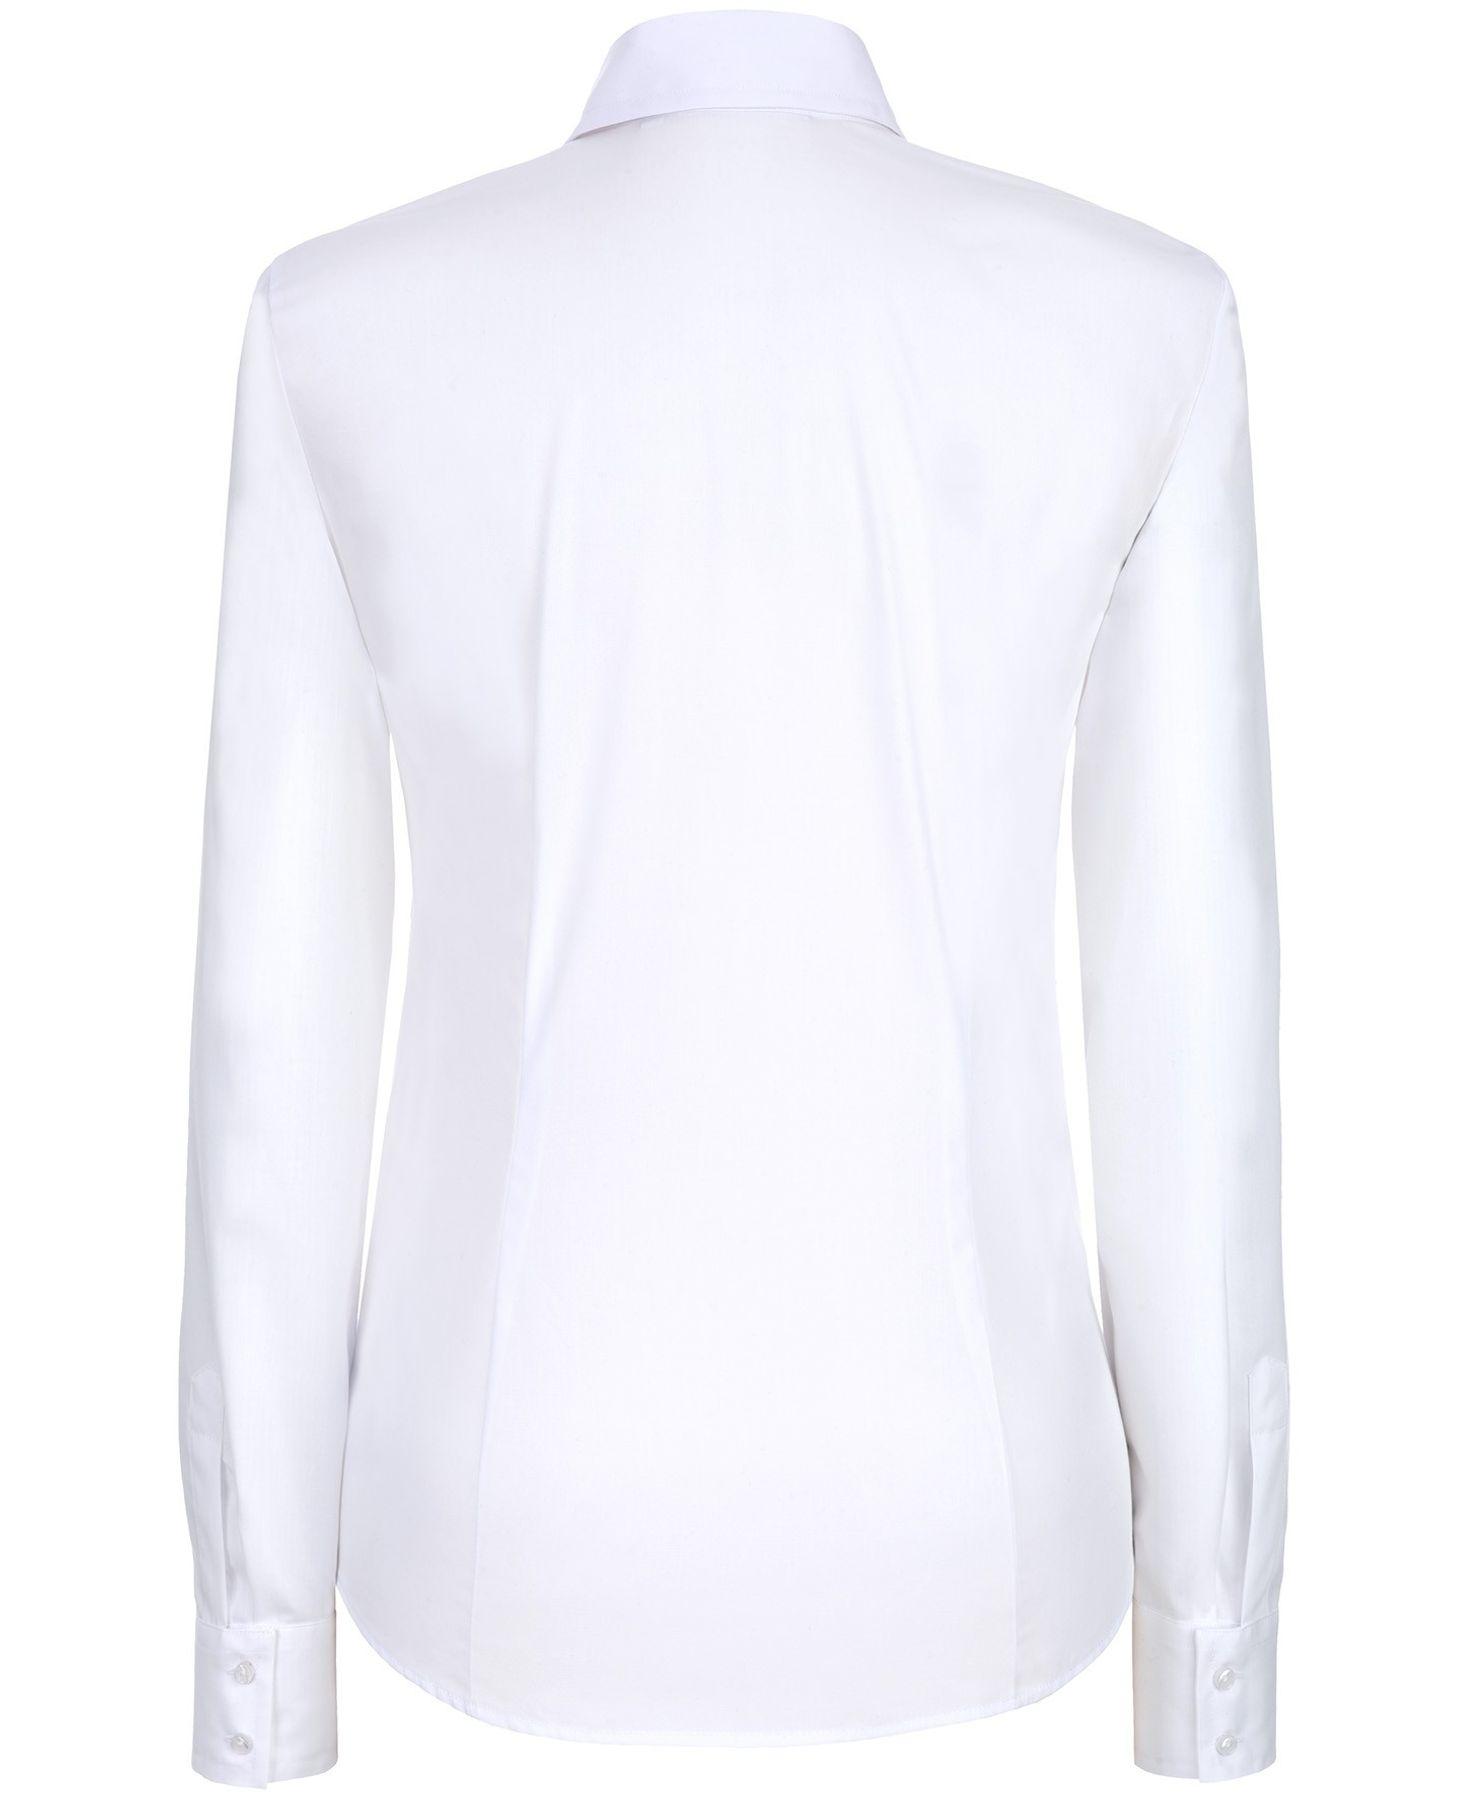 Eterna -  Comfort-Fit - Damen Langarm Bluse in Hellblau kariert  (5330 D661) – Bild 3